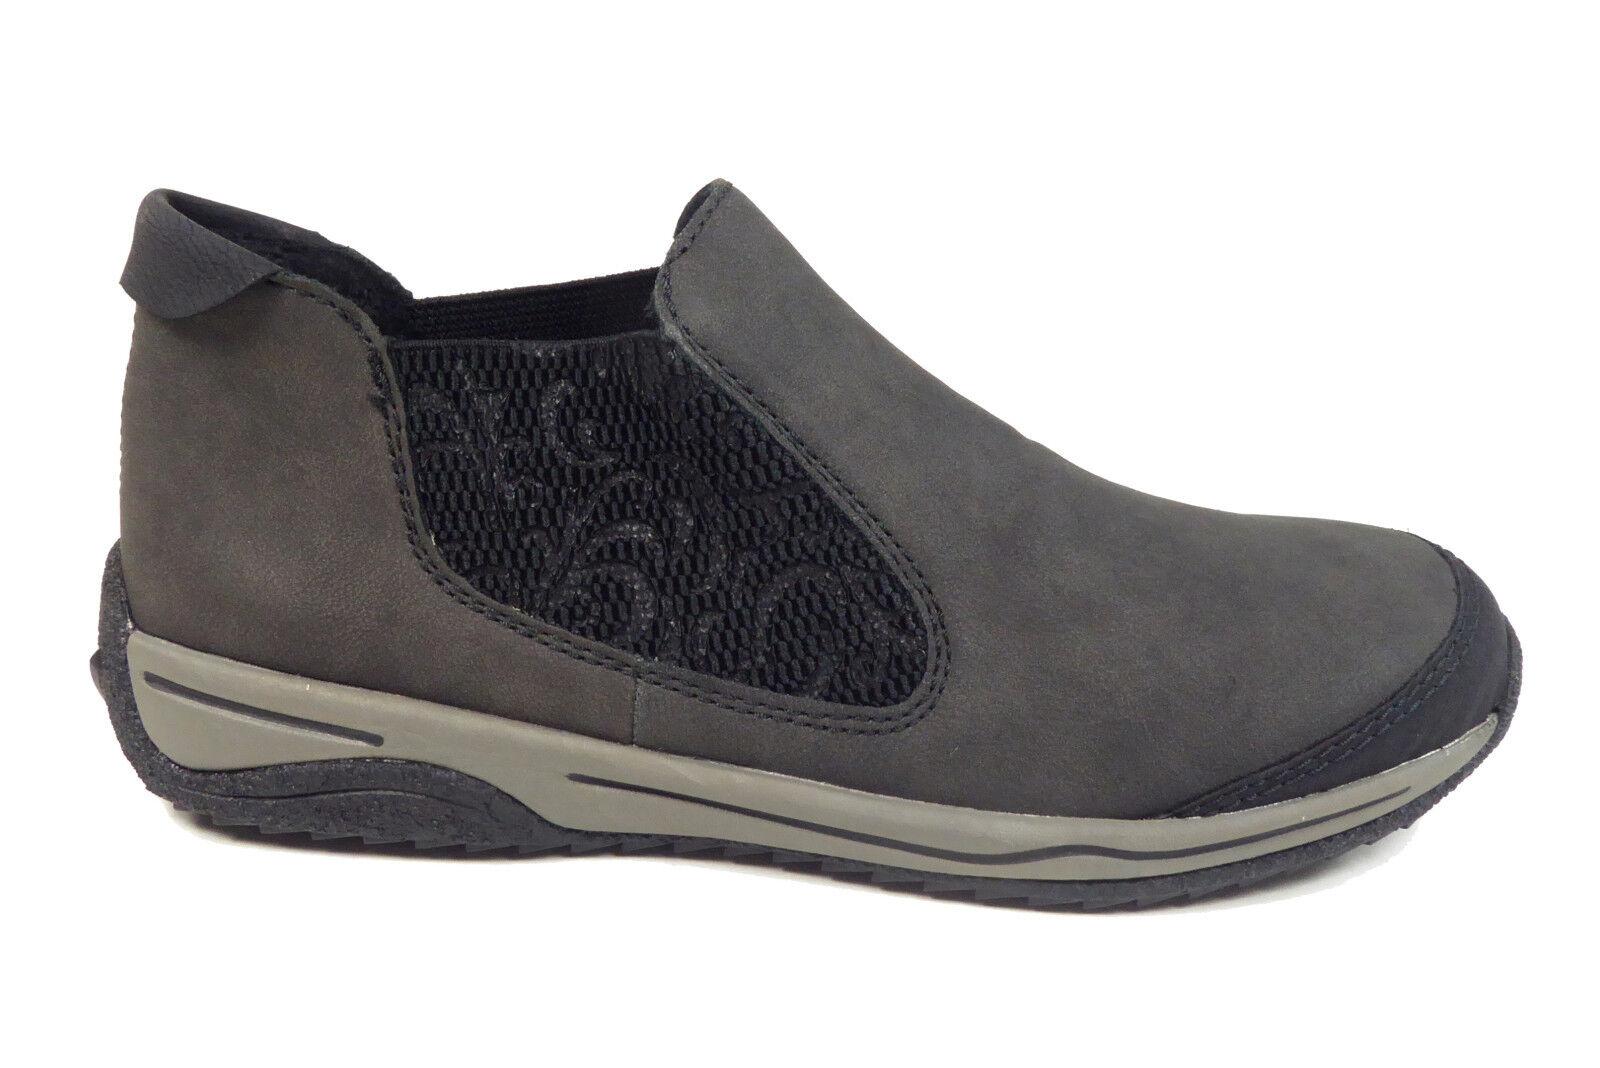 Rieker Damenhalbschuhe Chelsea-Stiefel in Grau L5294-00